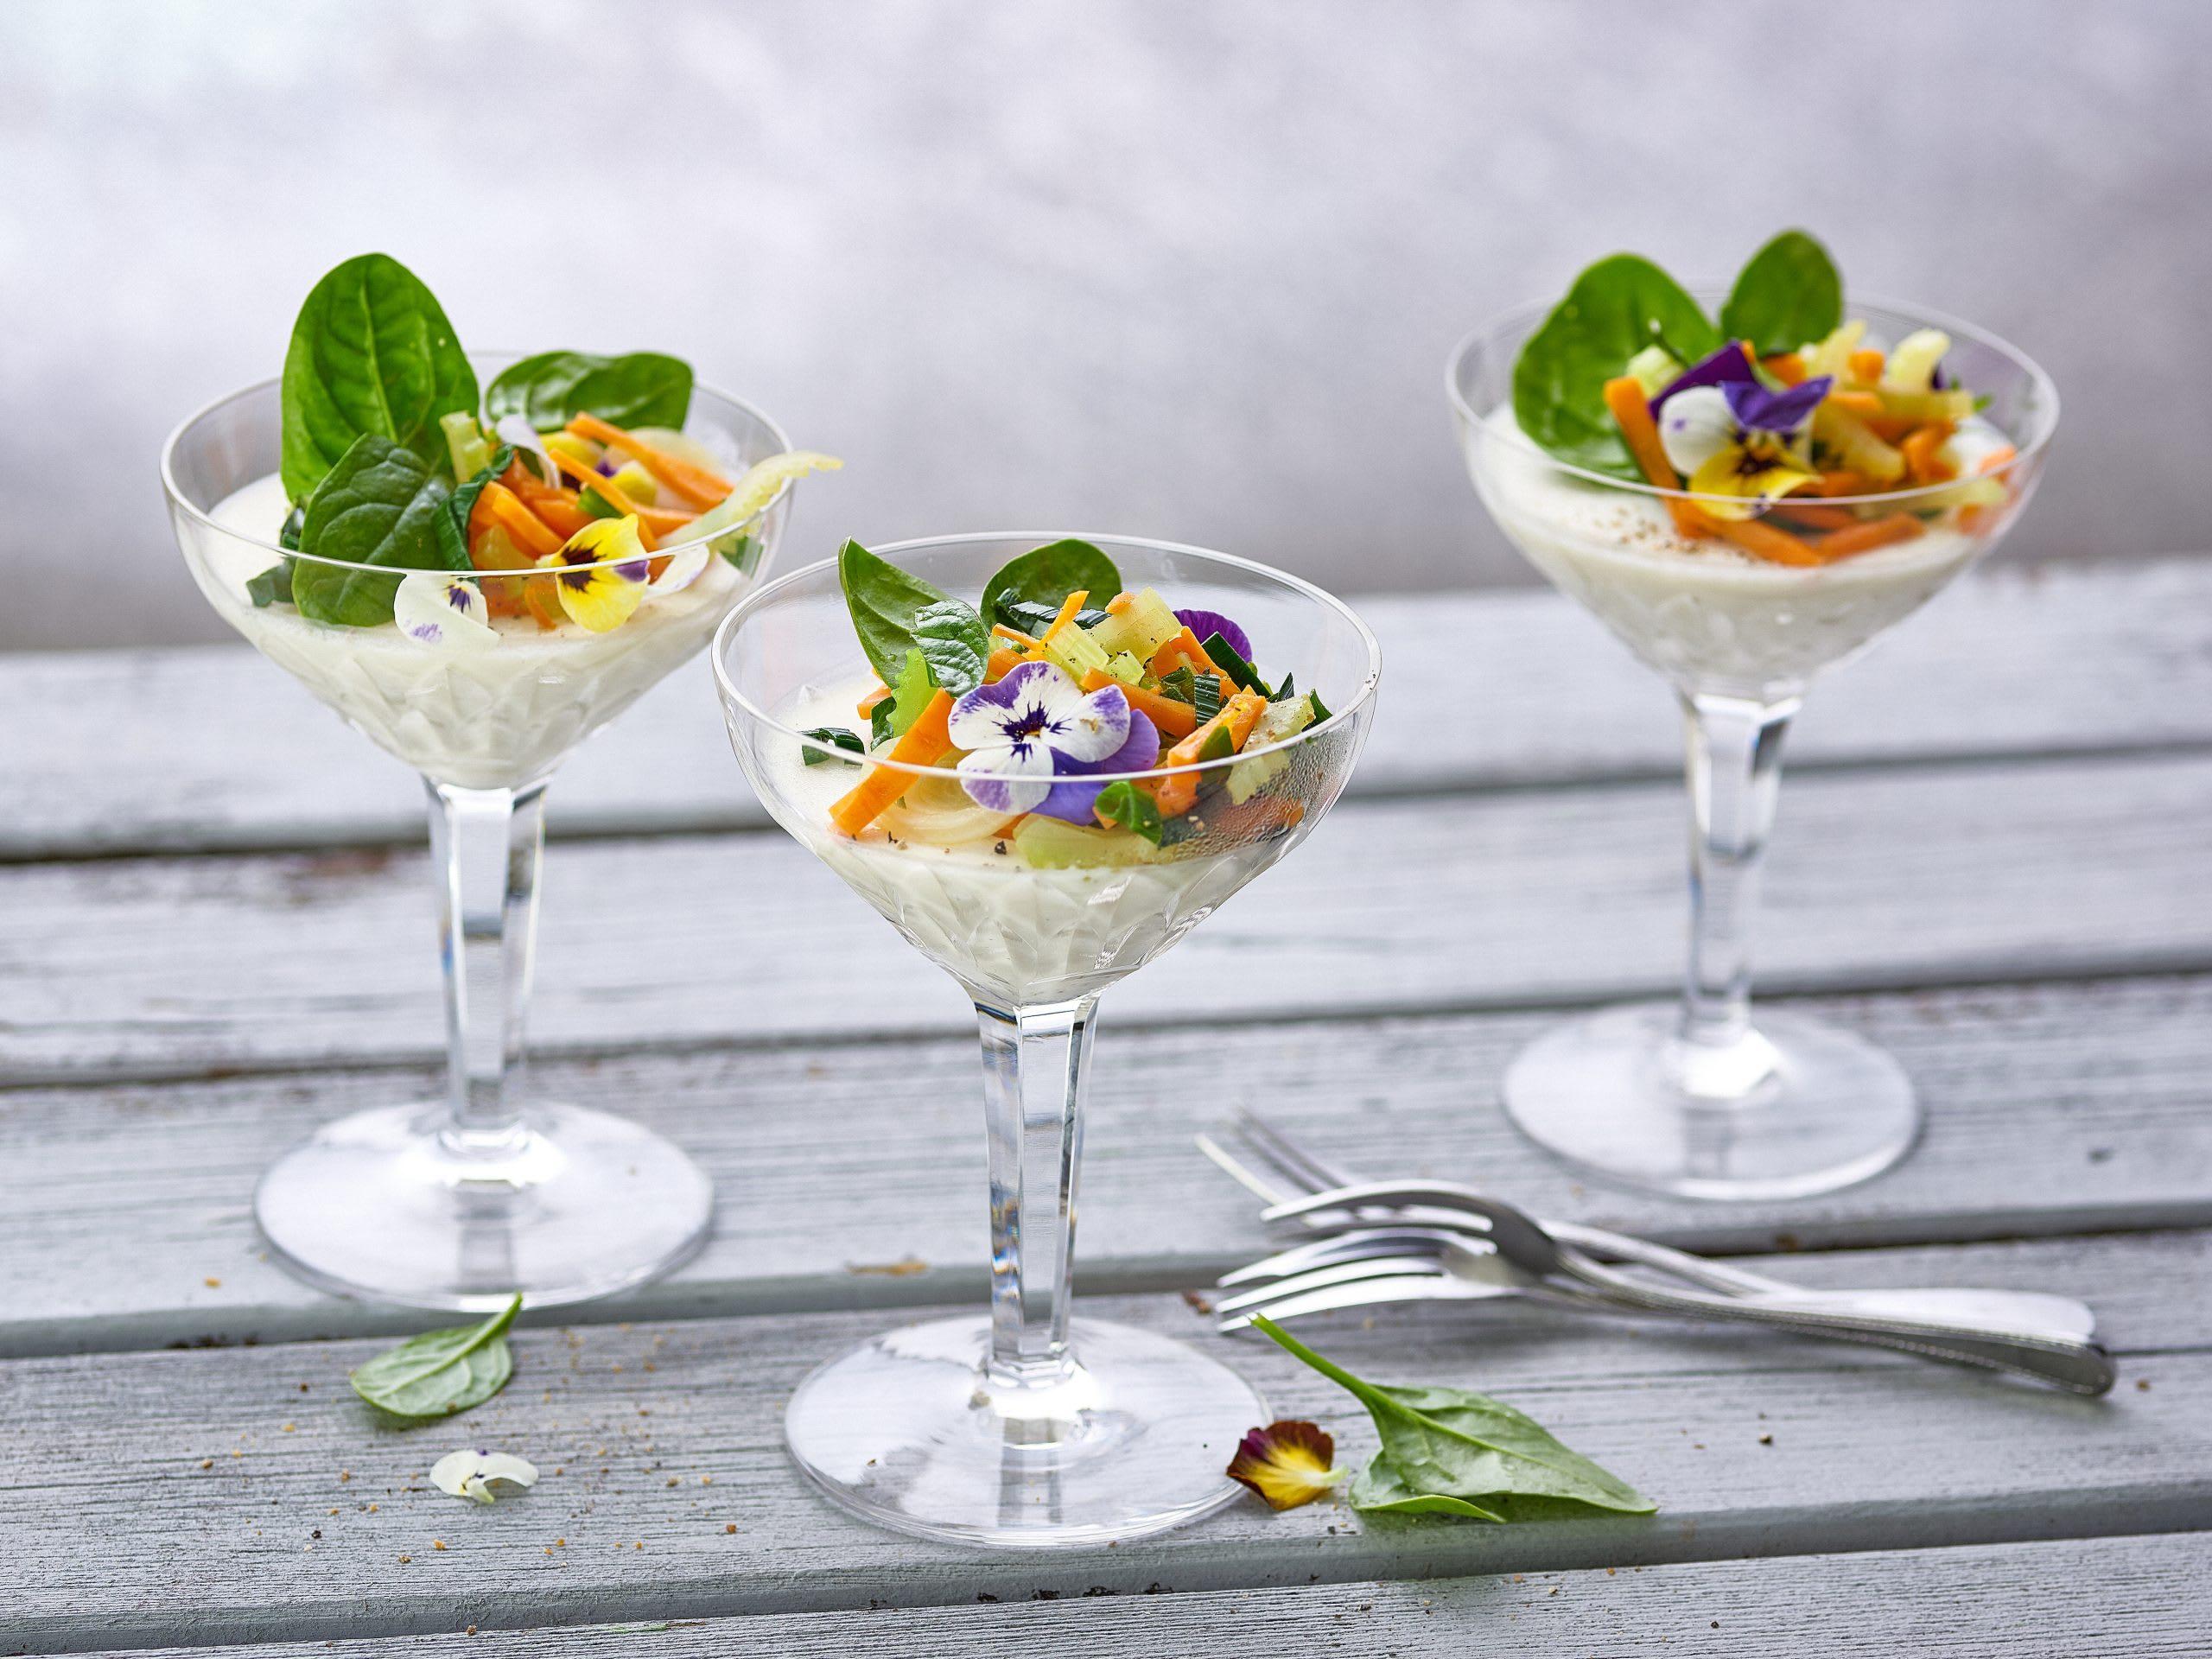 Panna cotta à la mozzarella et salade de légumes